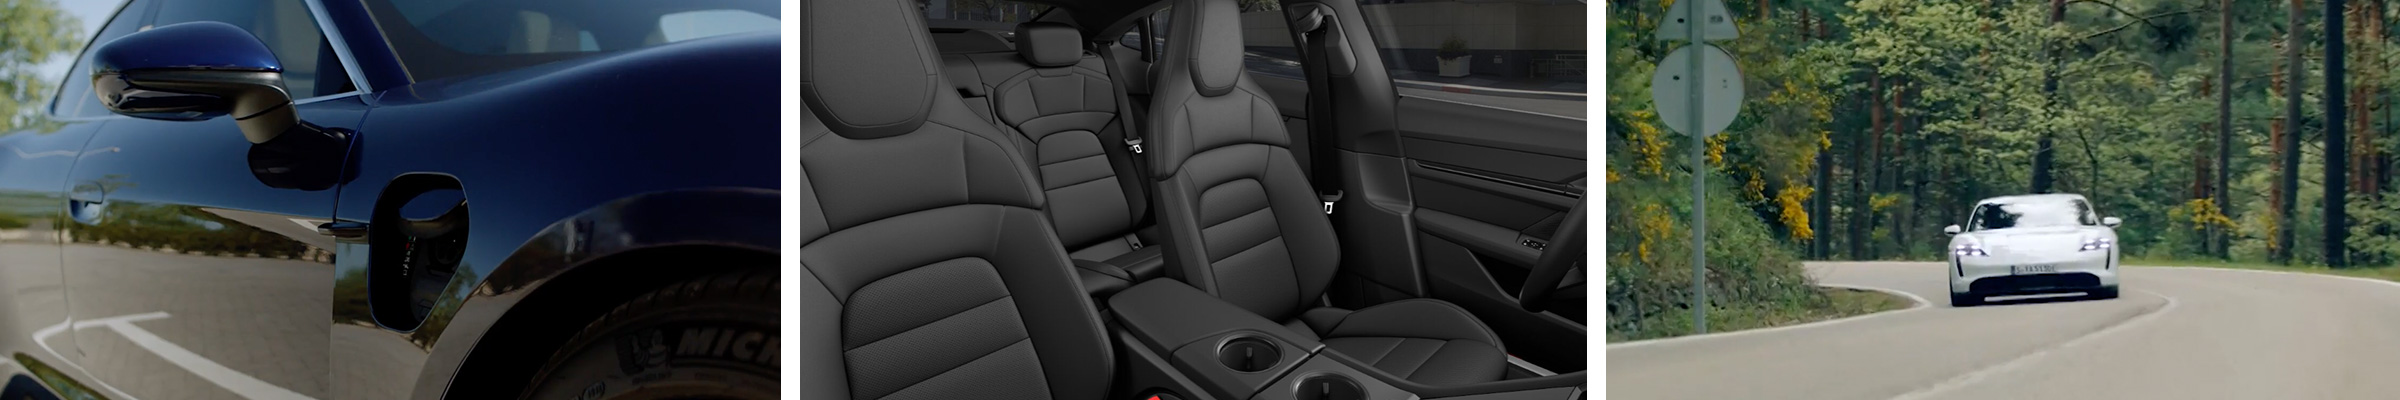 2020 Porsche Taycan For Sale Denver CO   Lakewood